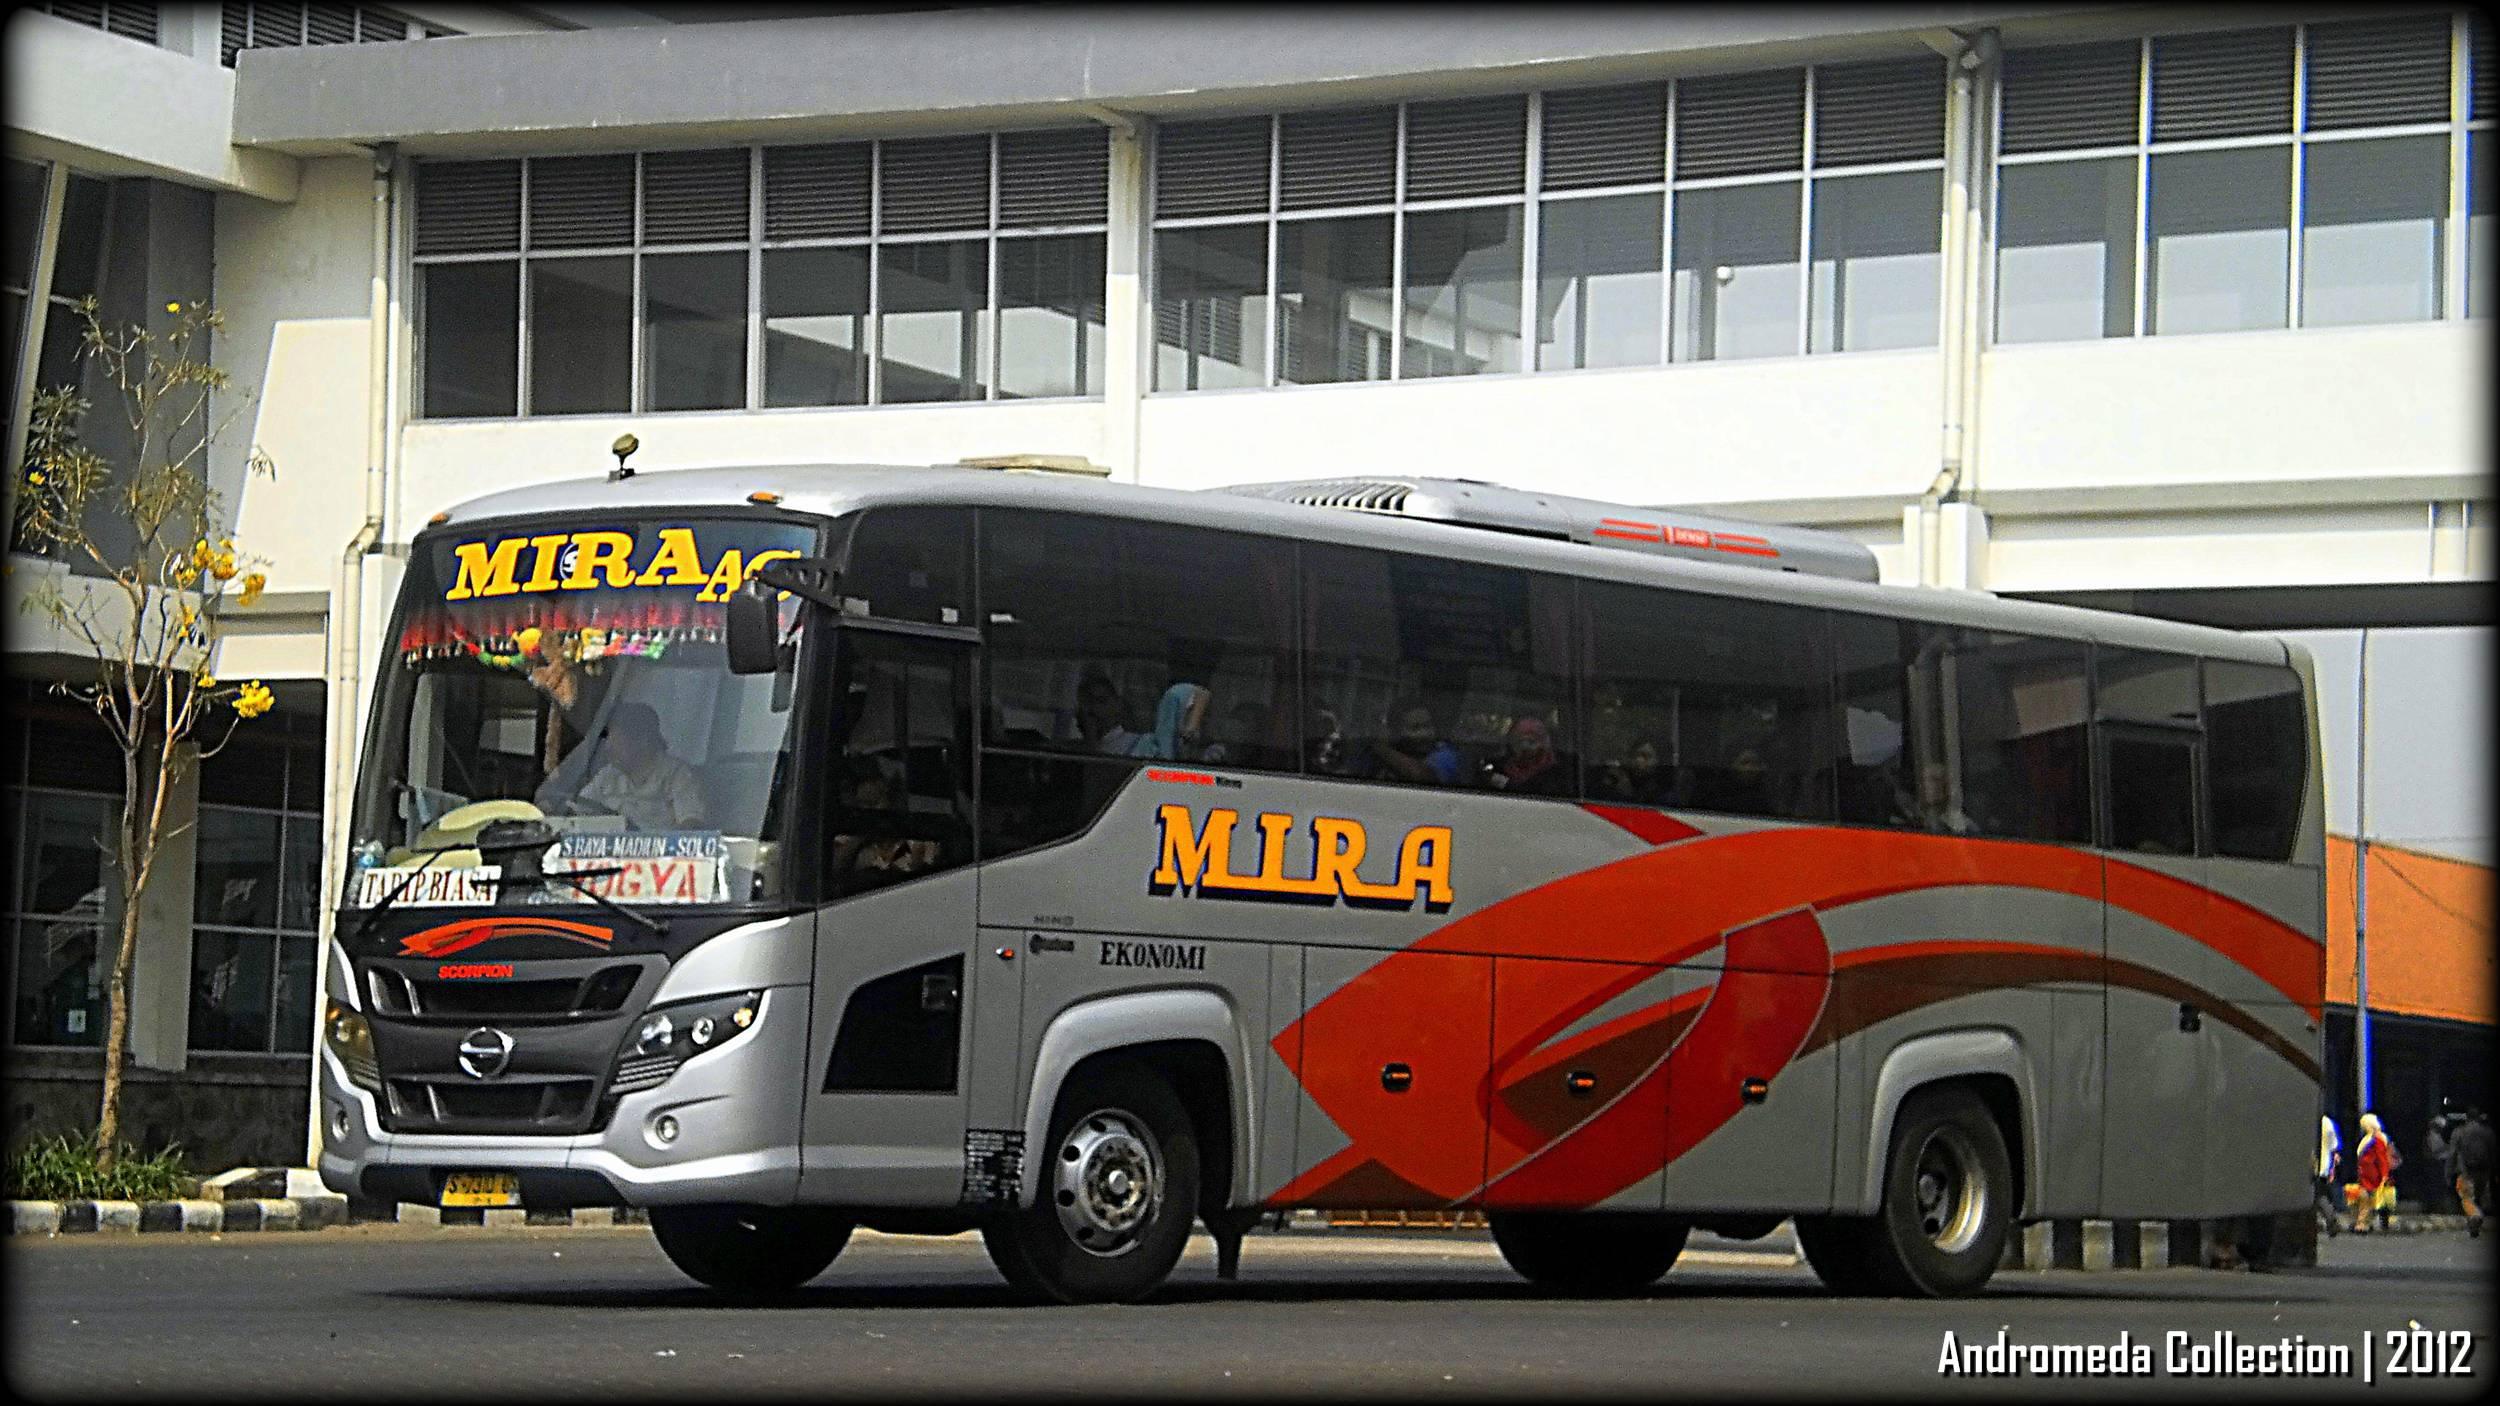 Loker Kota Bandung 2013 Lowongan Kerja Bp Indonesia Loker Cpns Bumn Bus Charter Rates Jakarta Harga Bus Bandung Bus Charter For Bandung